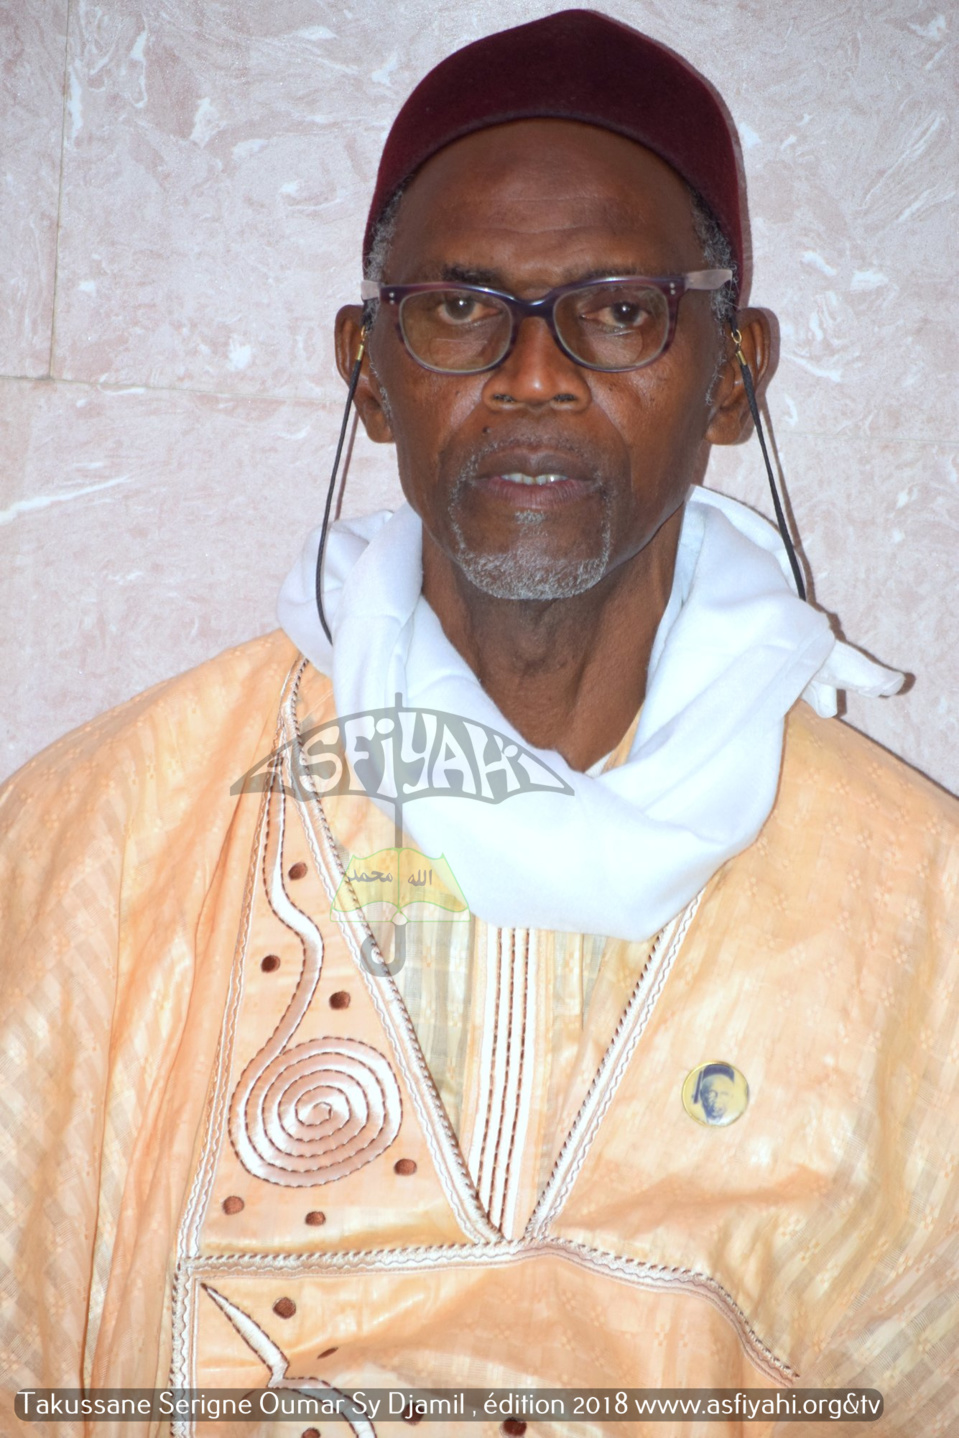 PHOTOS - Takussan Jamiya Seydi Djamil de Fass : Sacré Coeur III à l'honneur